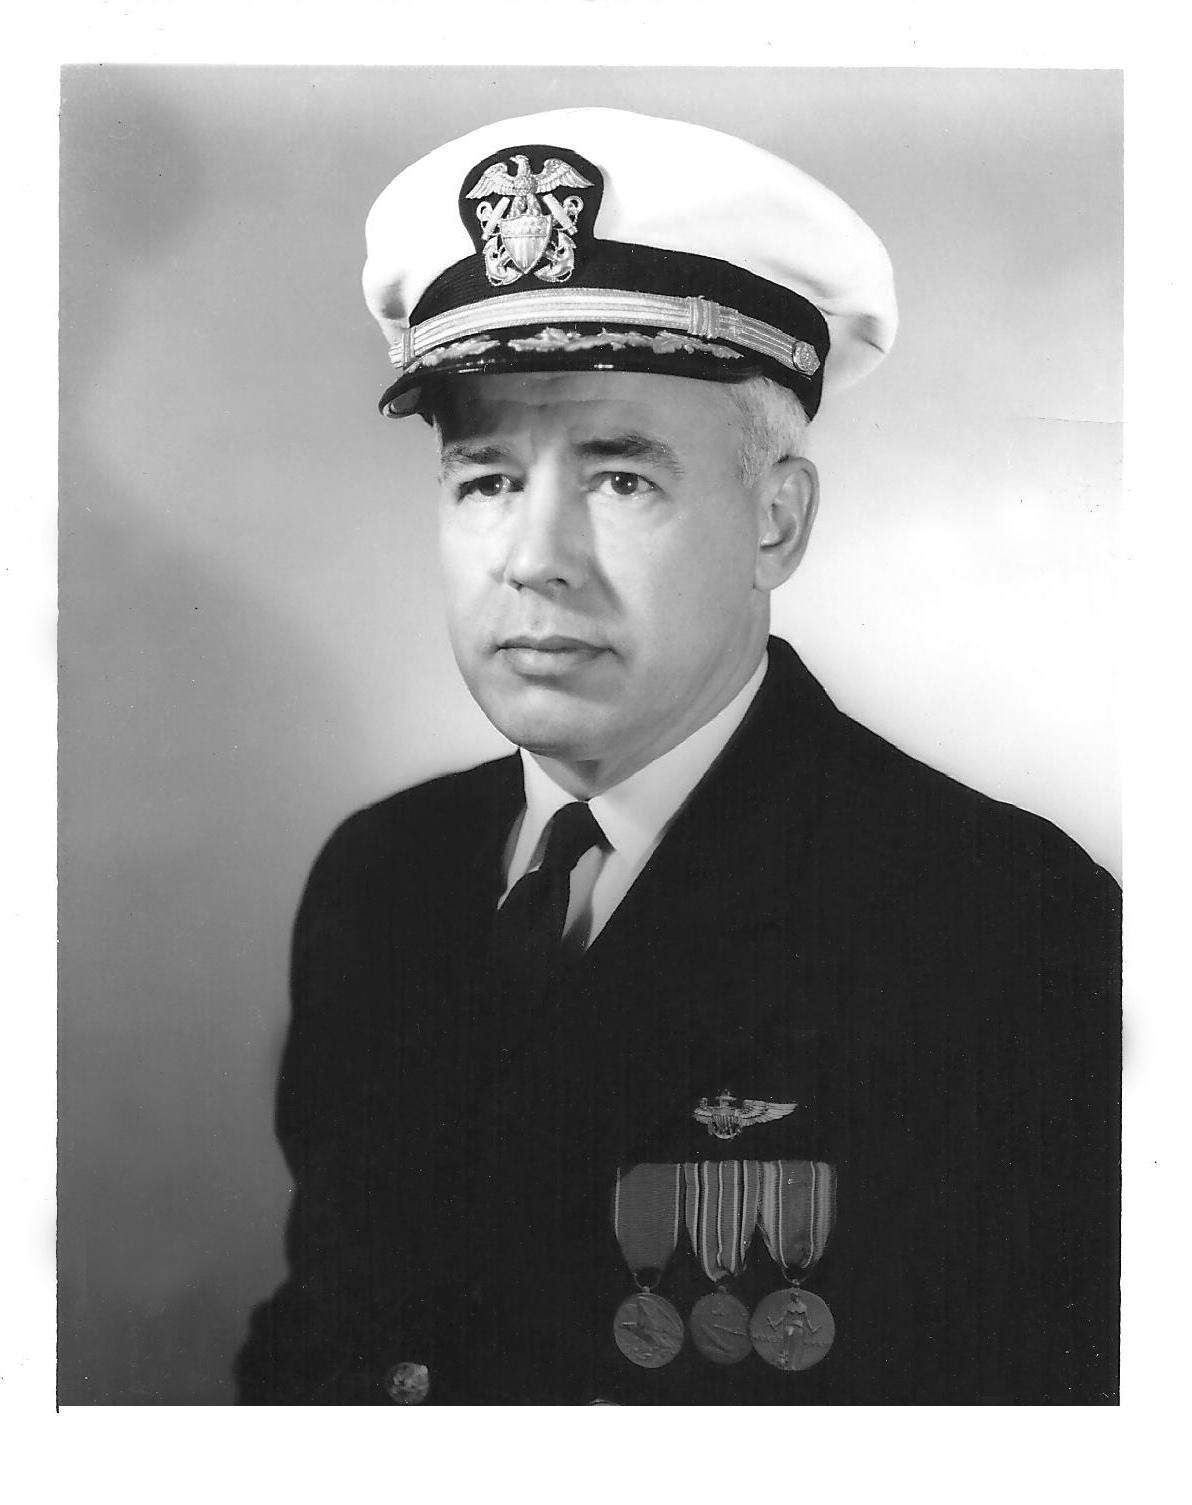 Donald Louis Litton